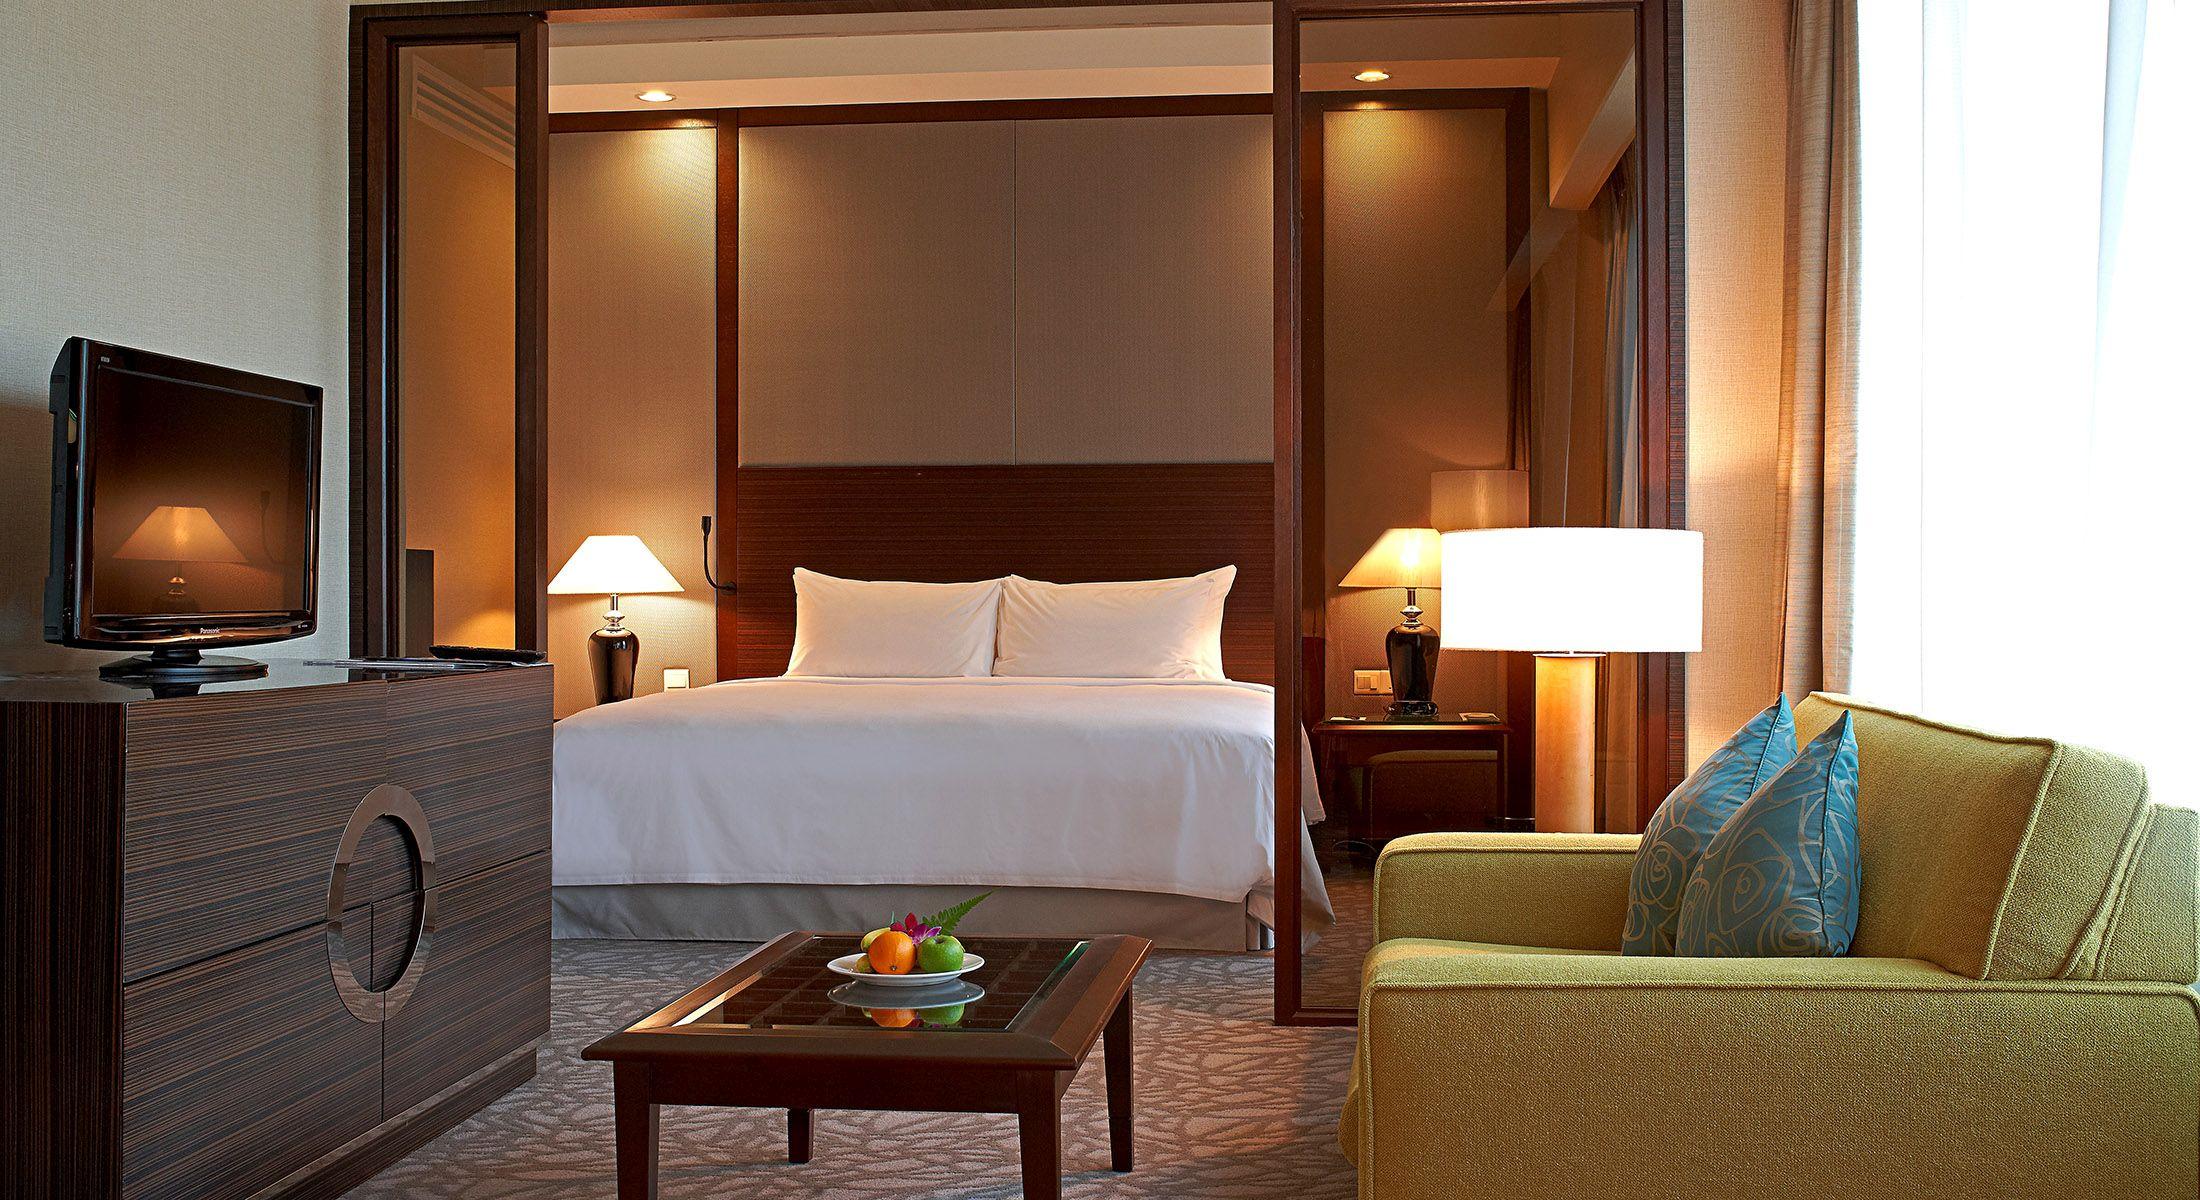 Luxury Business Hotel In Petaling Jaya Kuala Lumpur And Penang